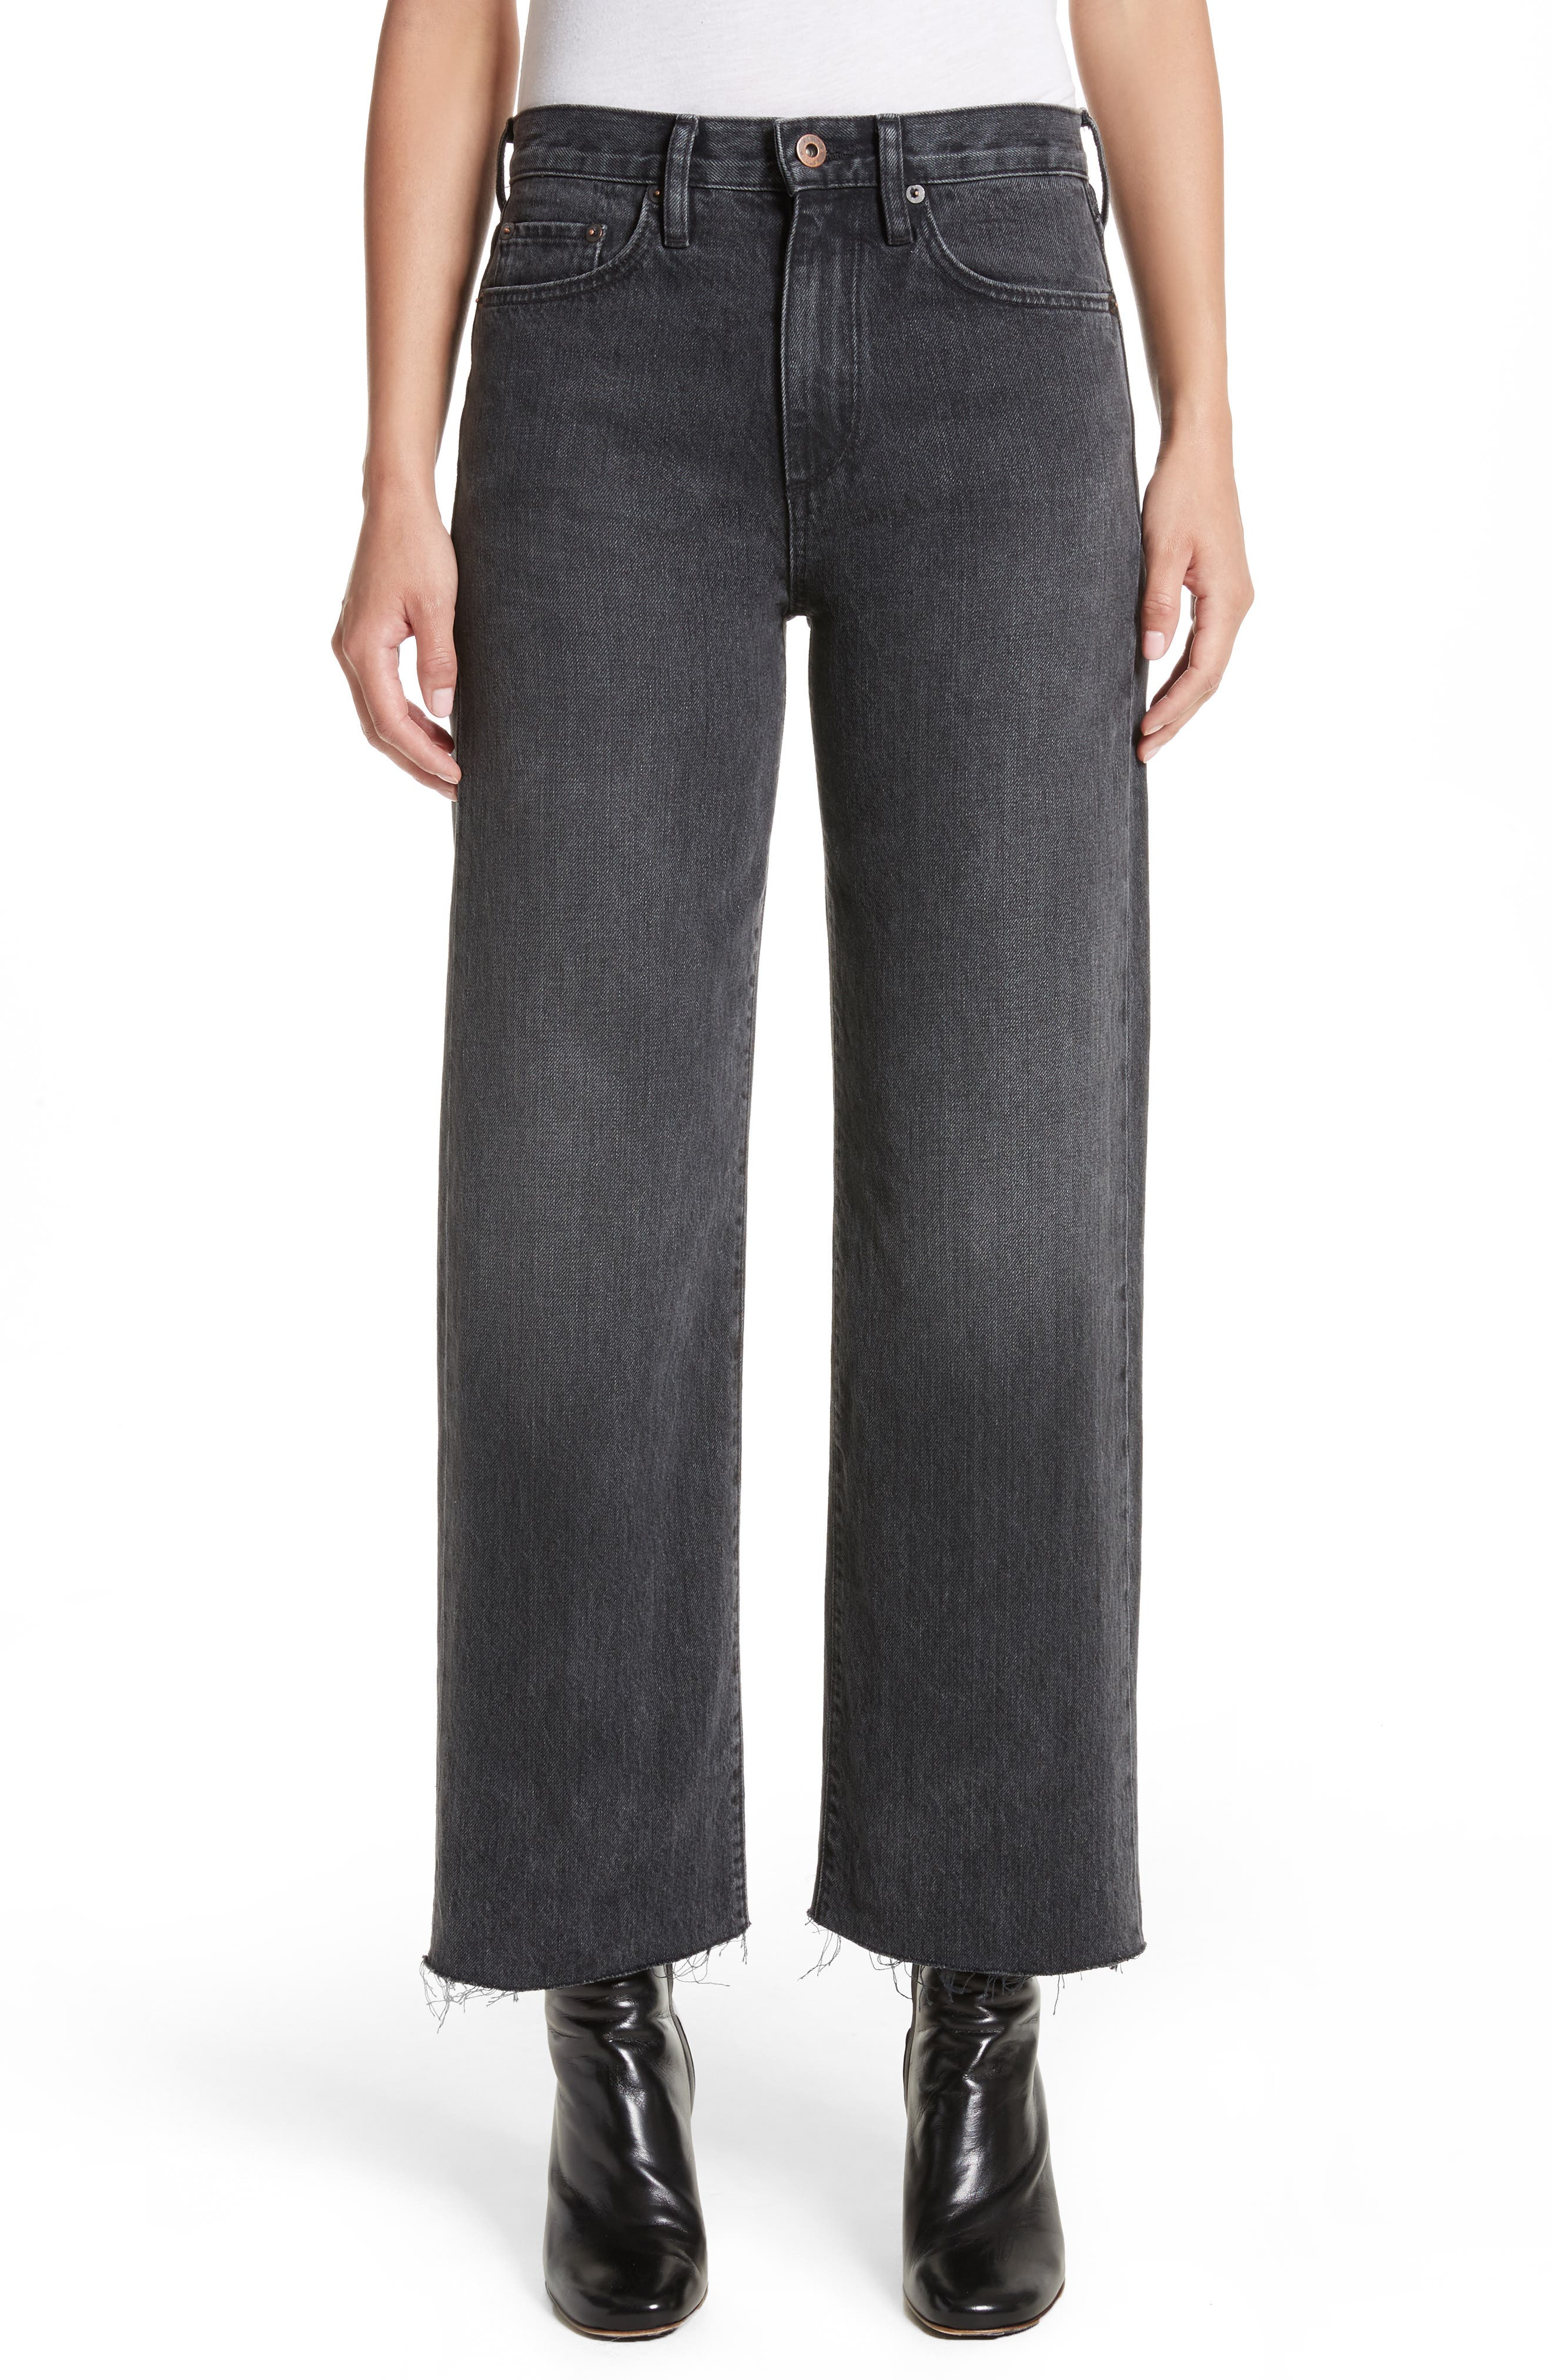 Tilson Crop Frayed Wide Leg Jeans,                             Main thumbnail 1, color,                             001